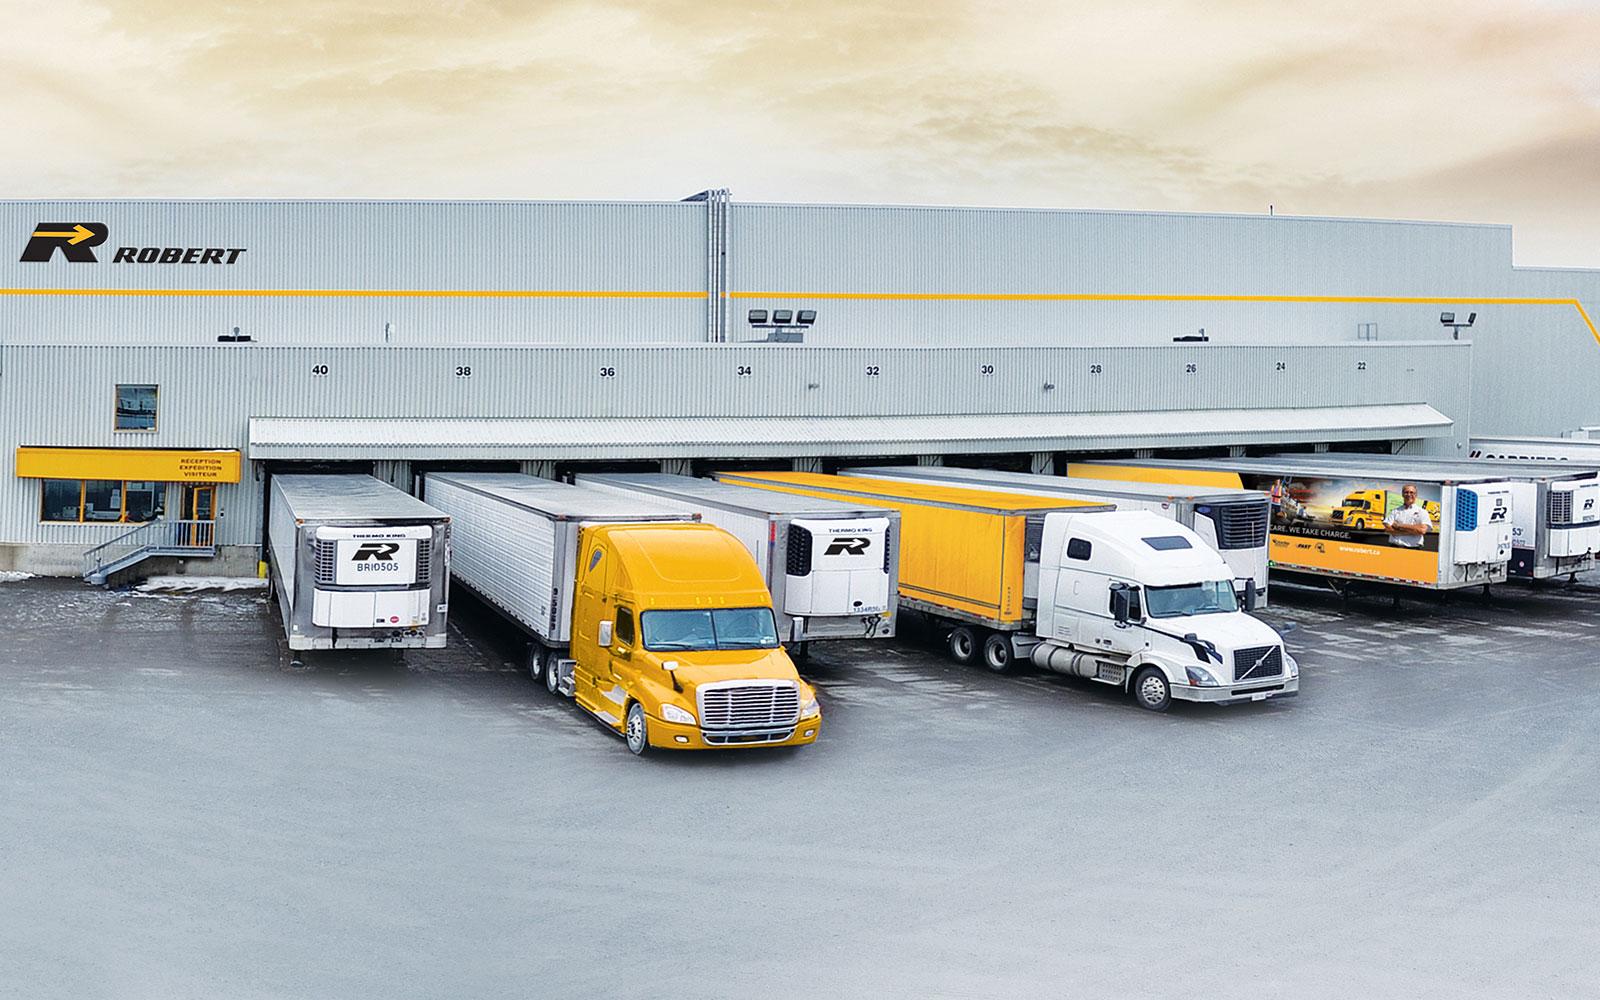 Groupe Robert - Transport, Distribution, Logistic, 3PL - Canada & U S